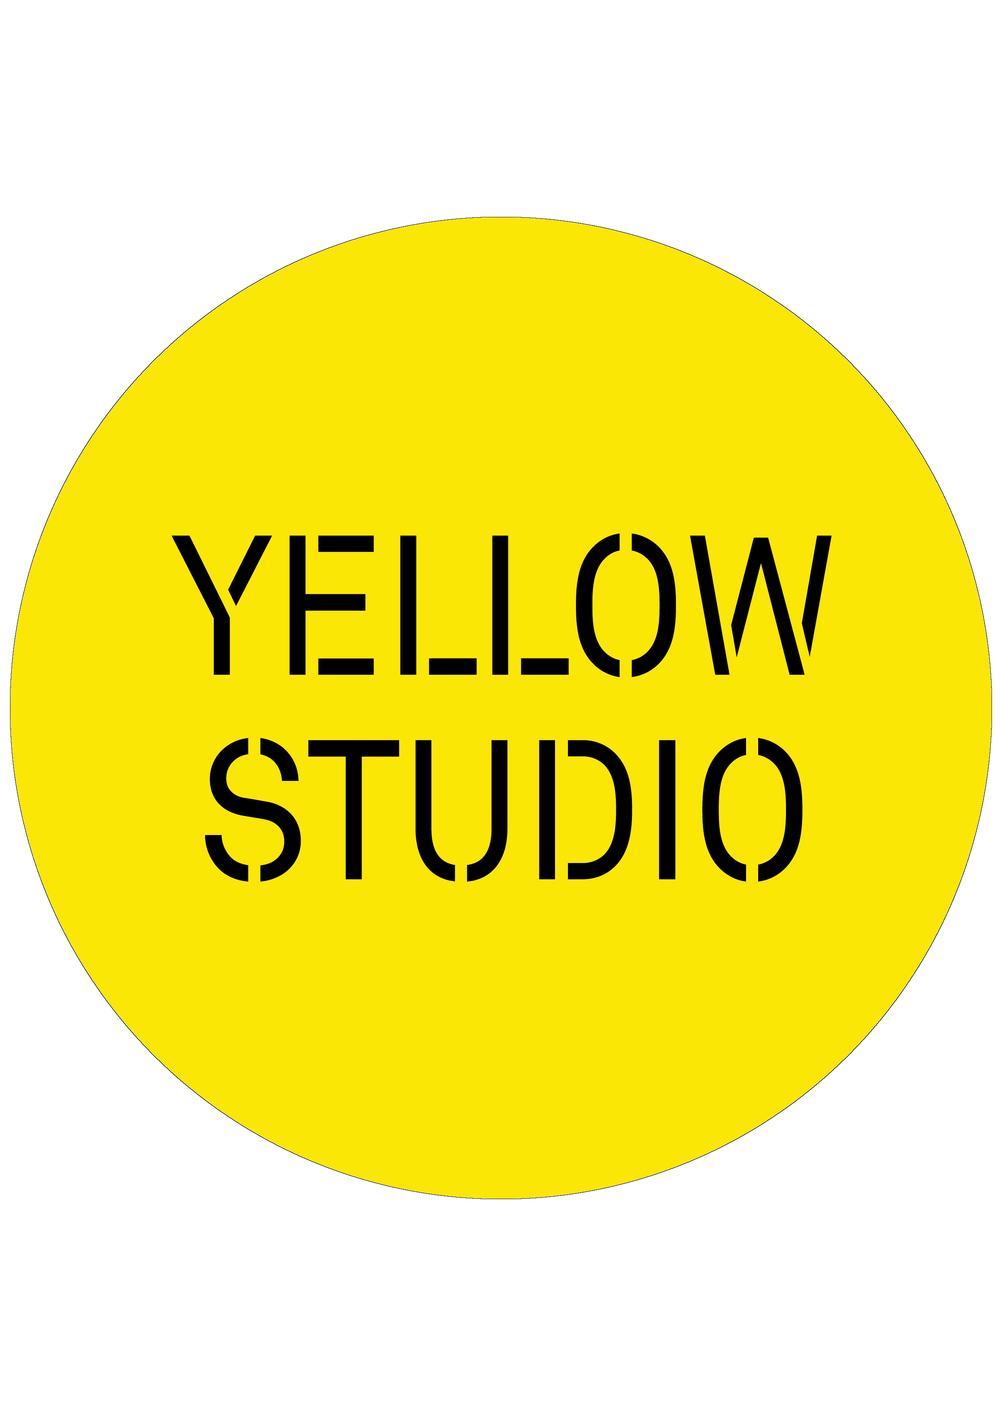 yellow studio logo.jpg